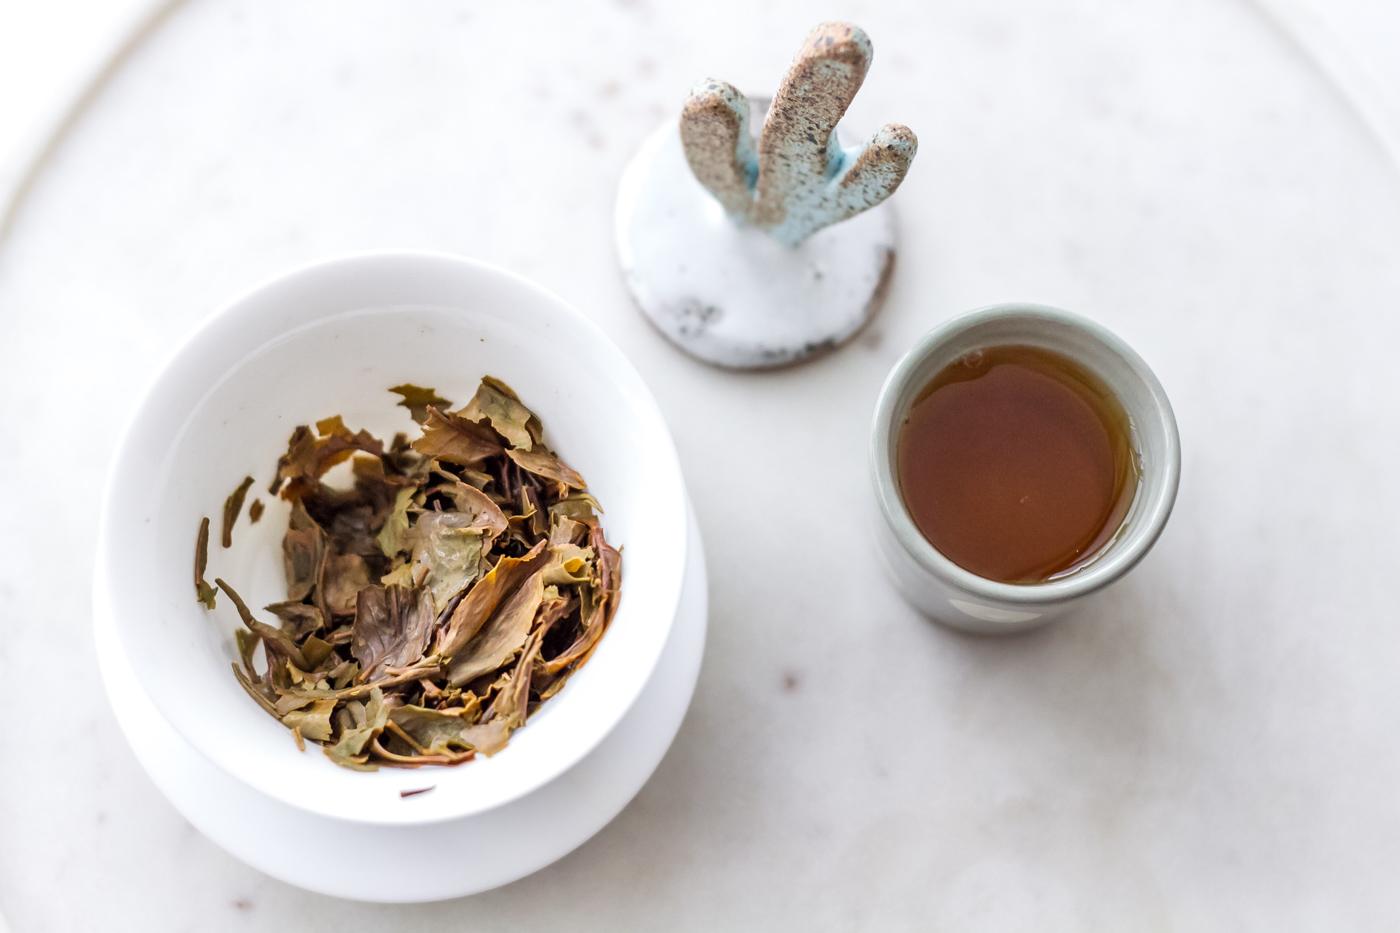 Nilgiri Blue Mountain frost tea